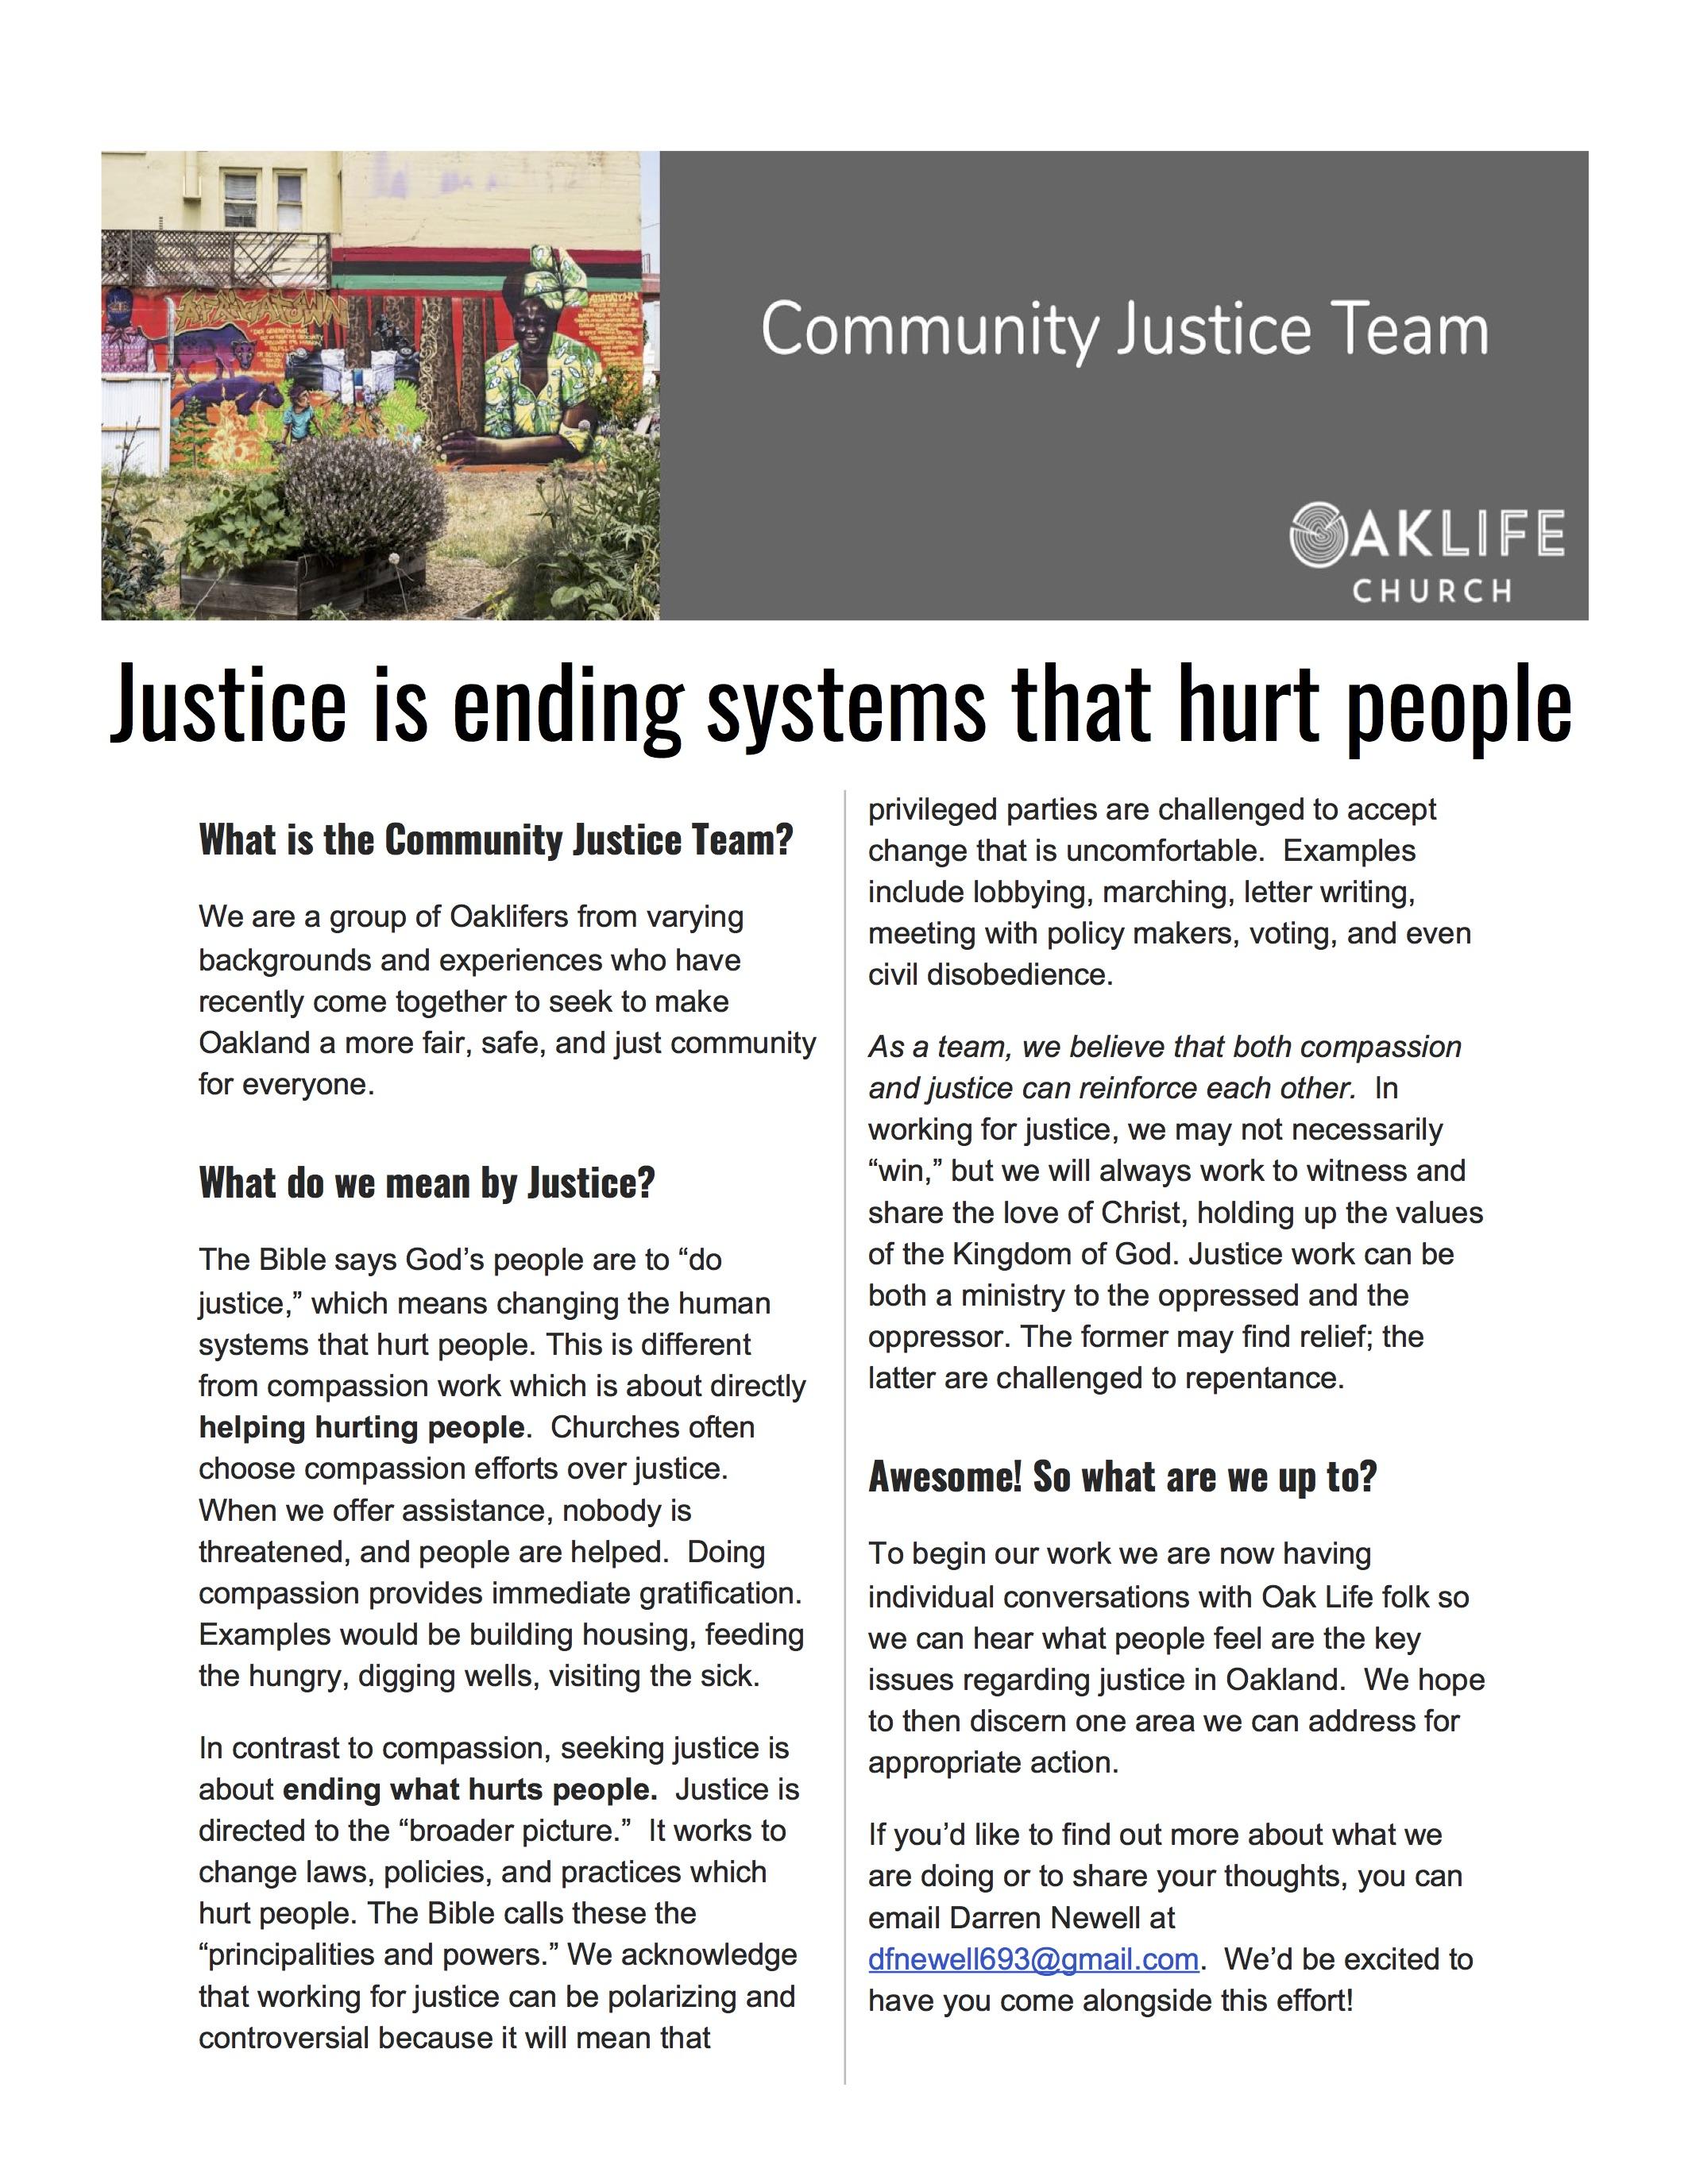 Community Justice Team.jpg